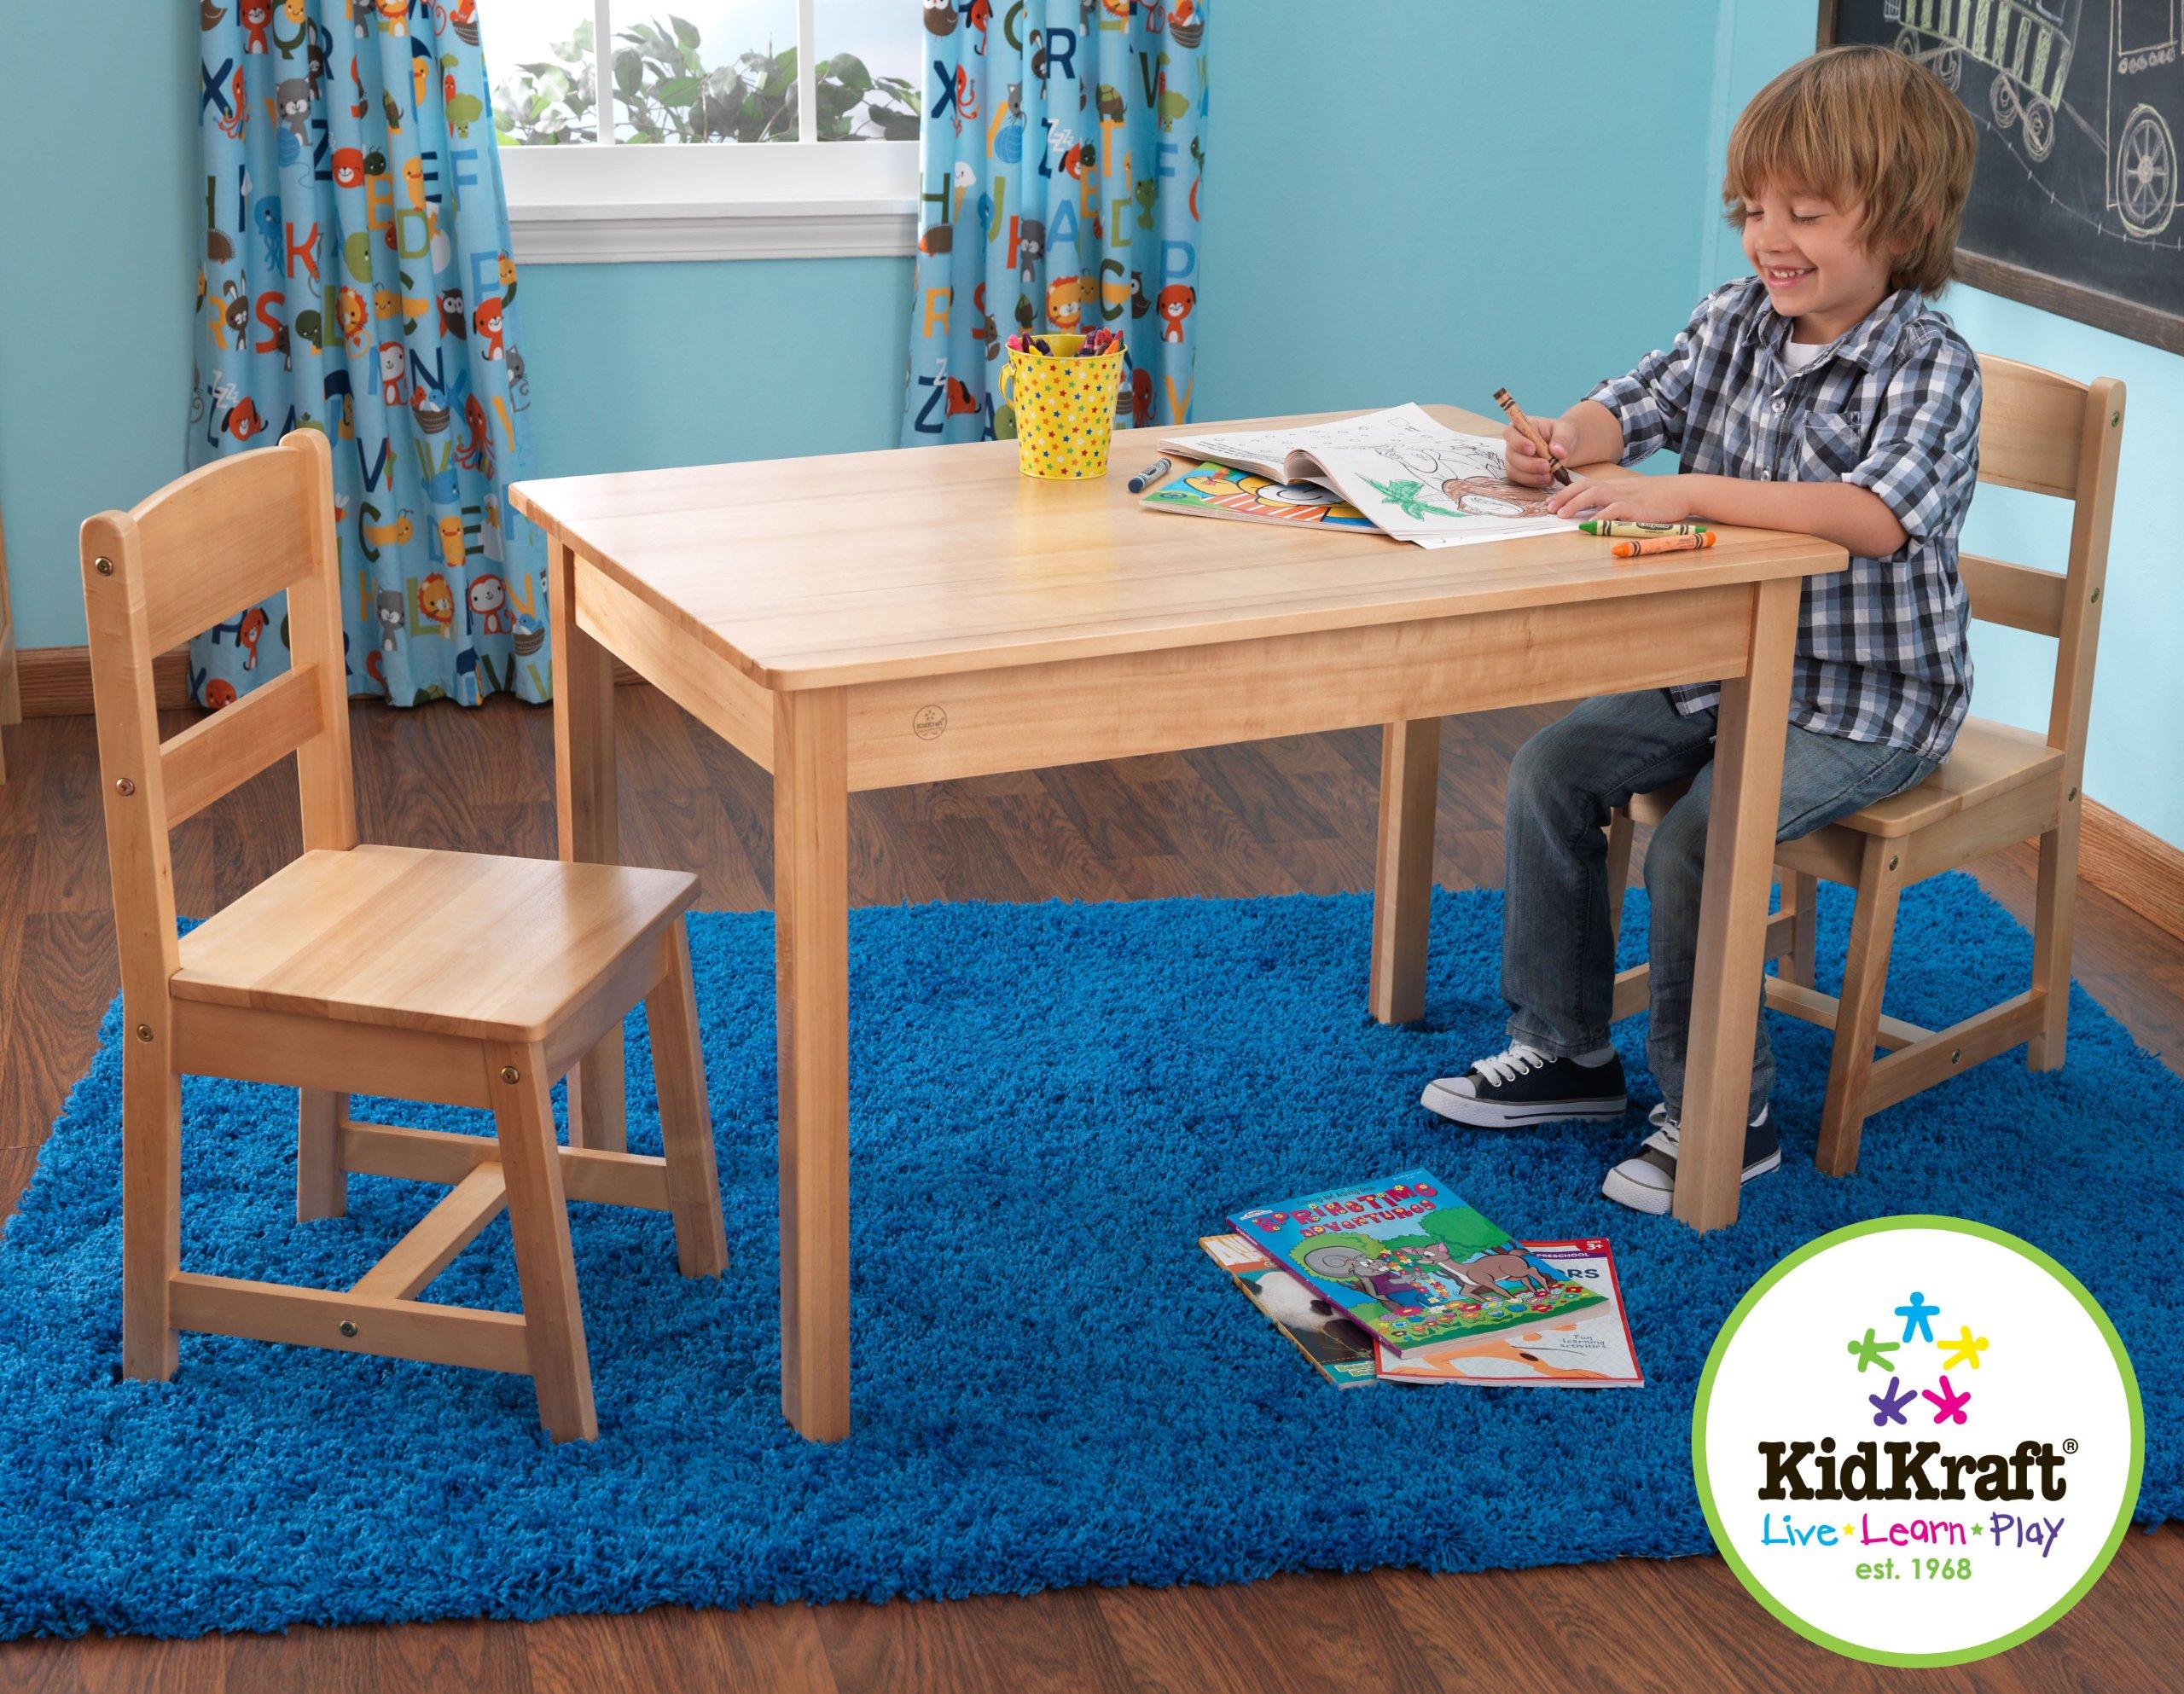 KidKraft Wooden Rectangular Table & 2 Chair Set For Kids - Natural by KidKraft